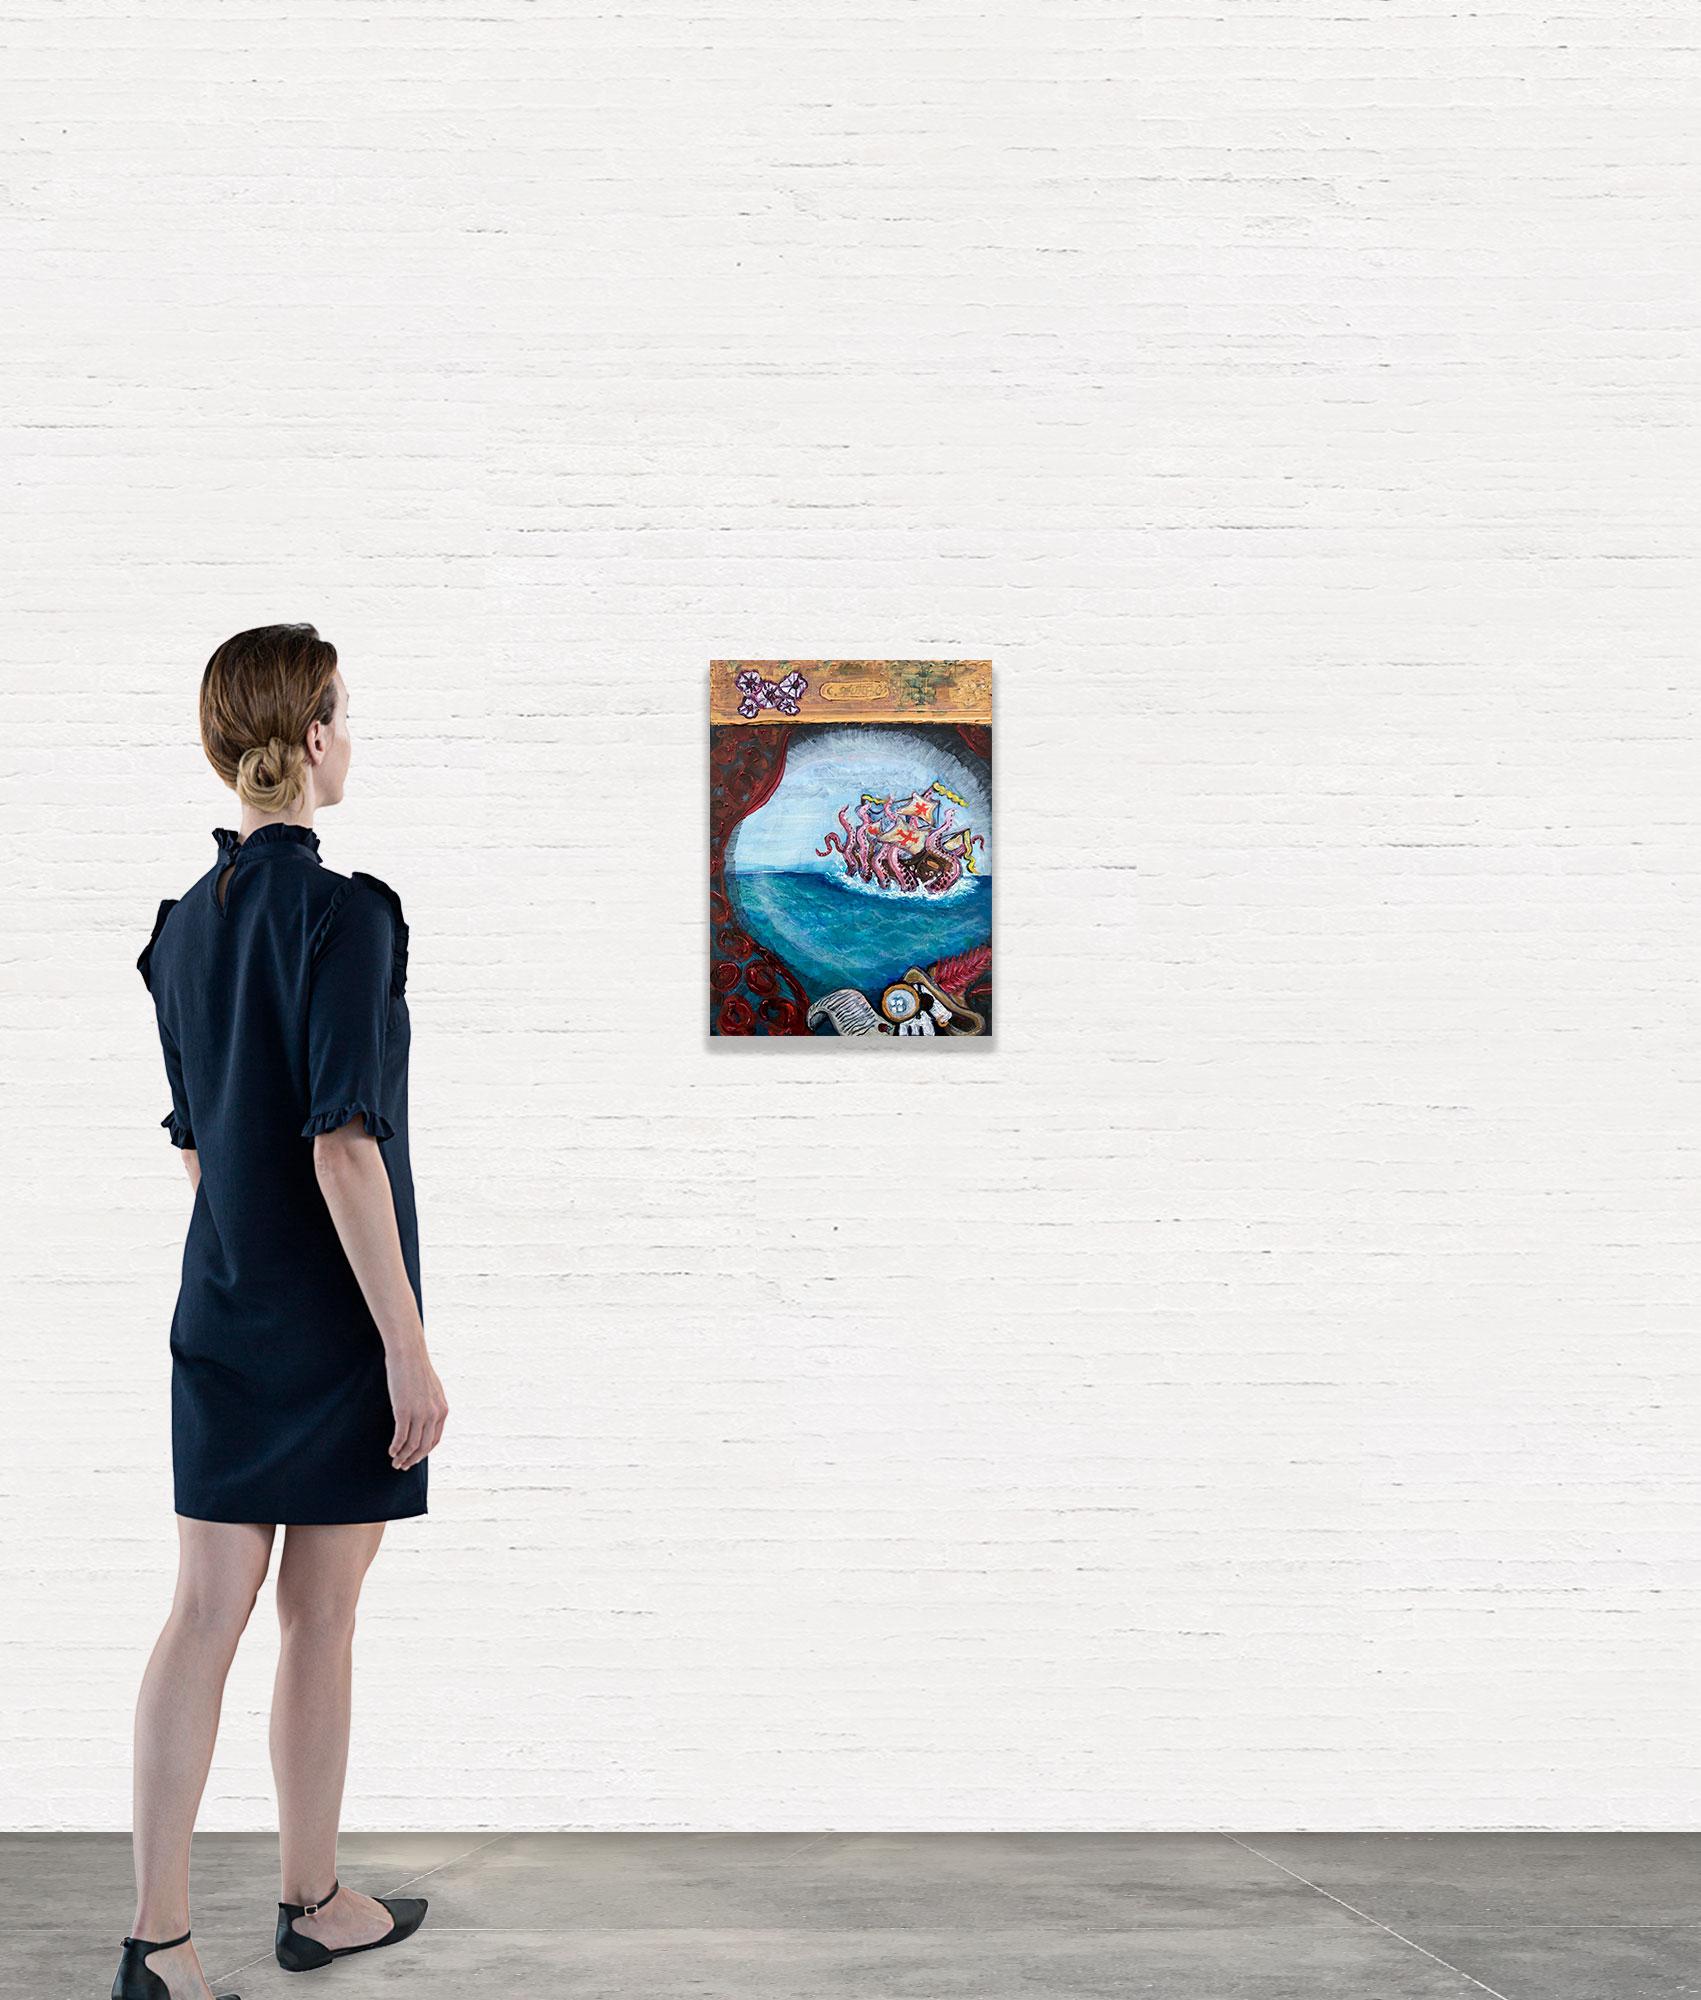 Casper_Soelberg_paintings_krakenII_Spectator.jpg